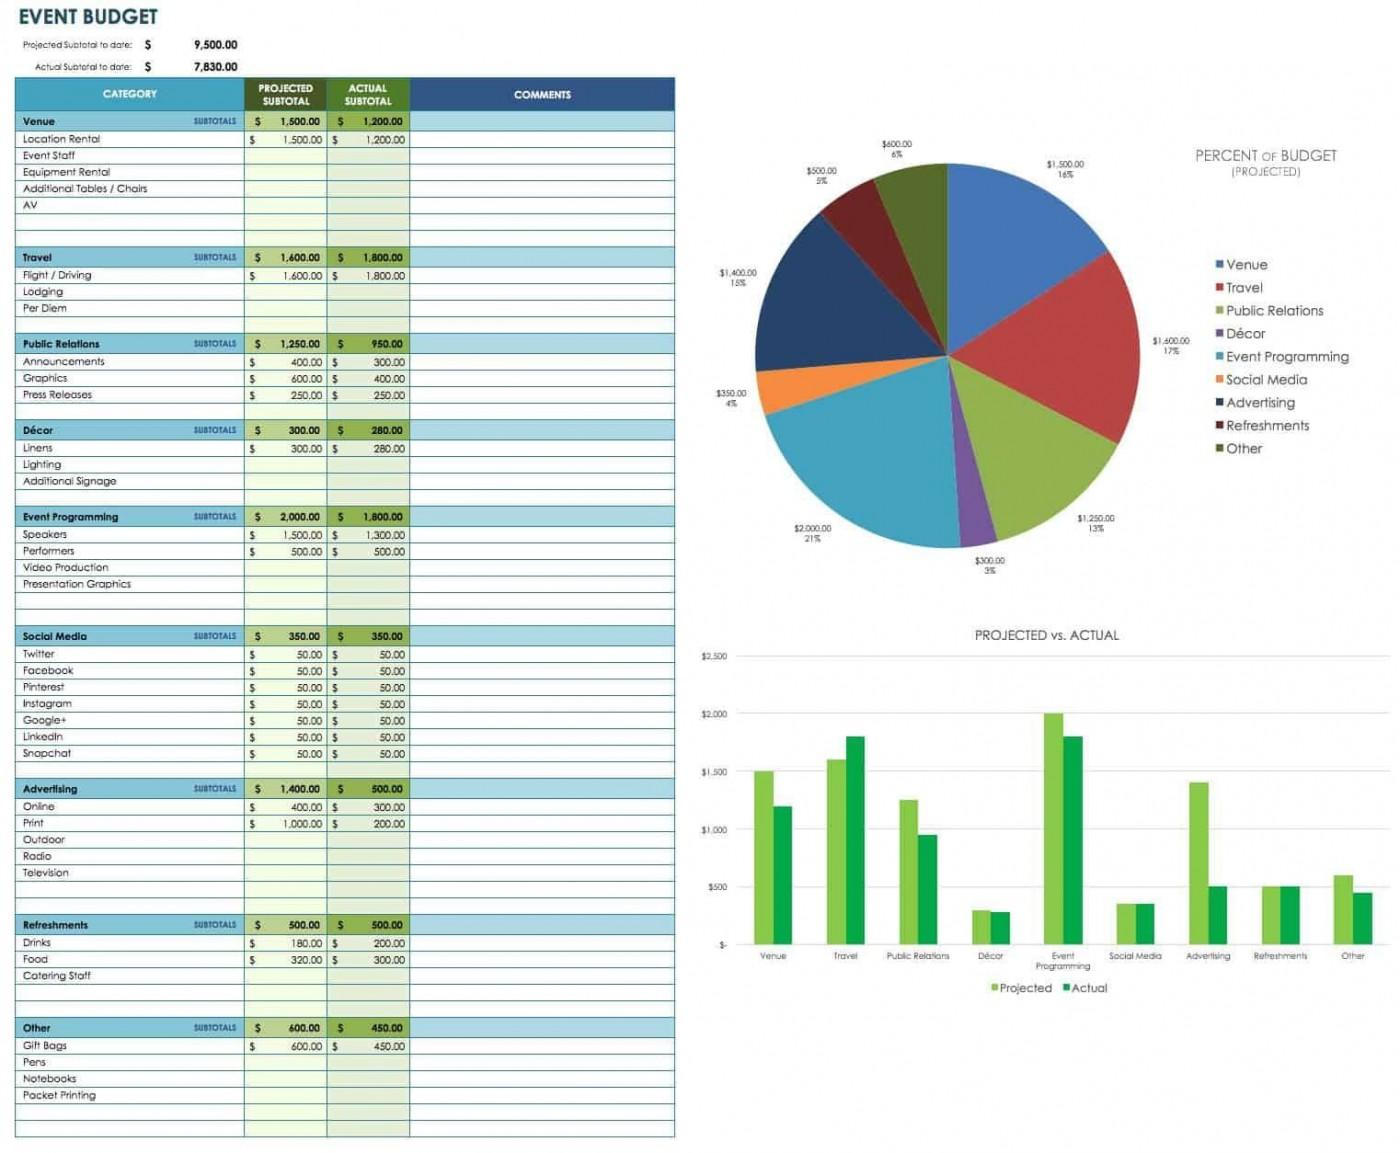 009 Surprising Line Item Budget Template Excel High Resolution 1400